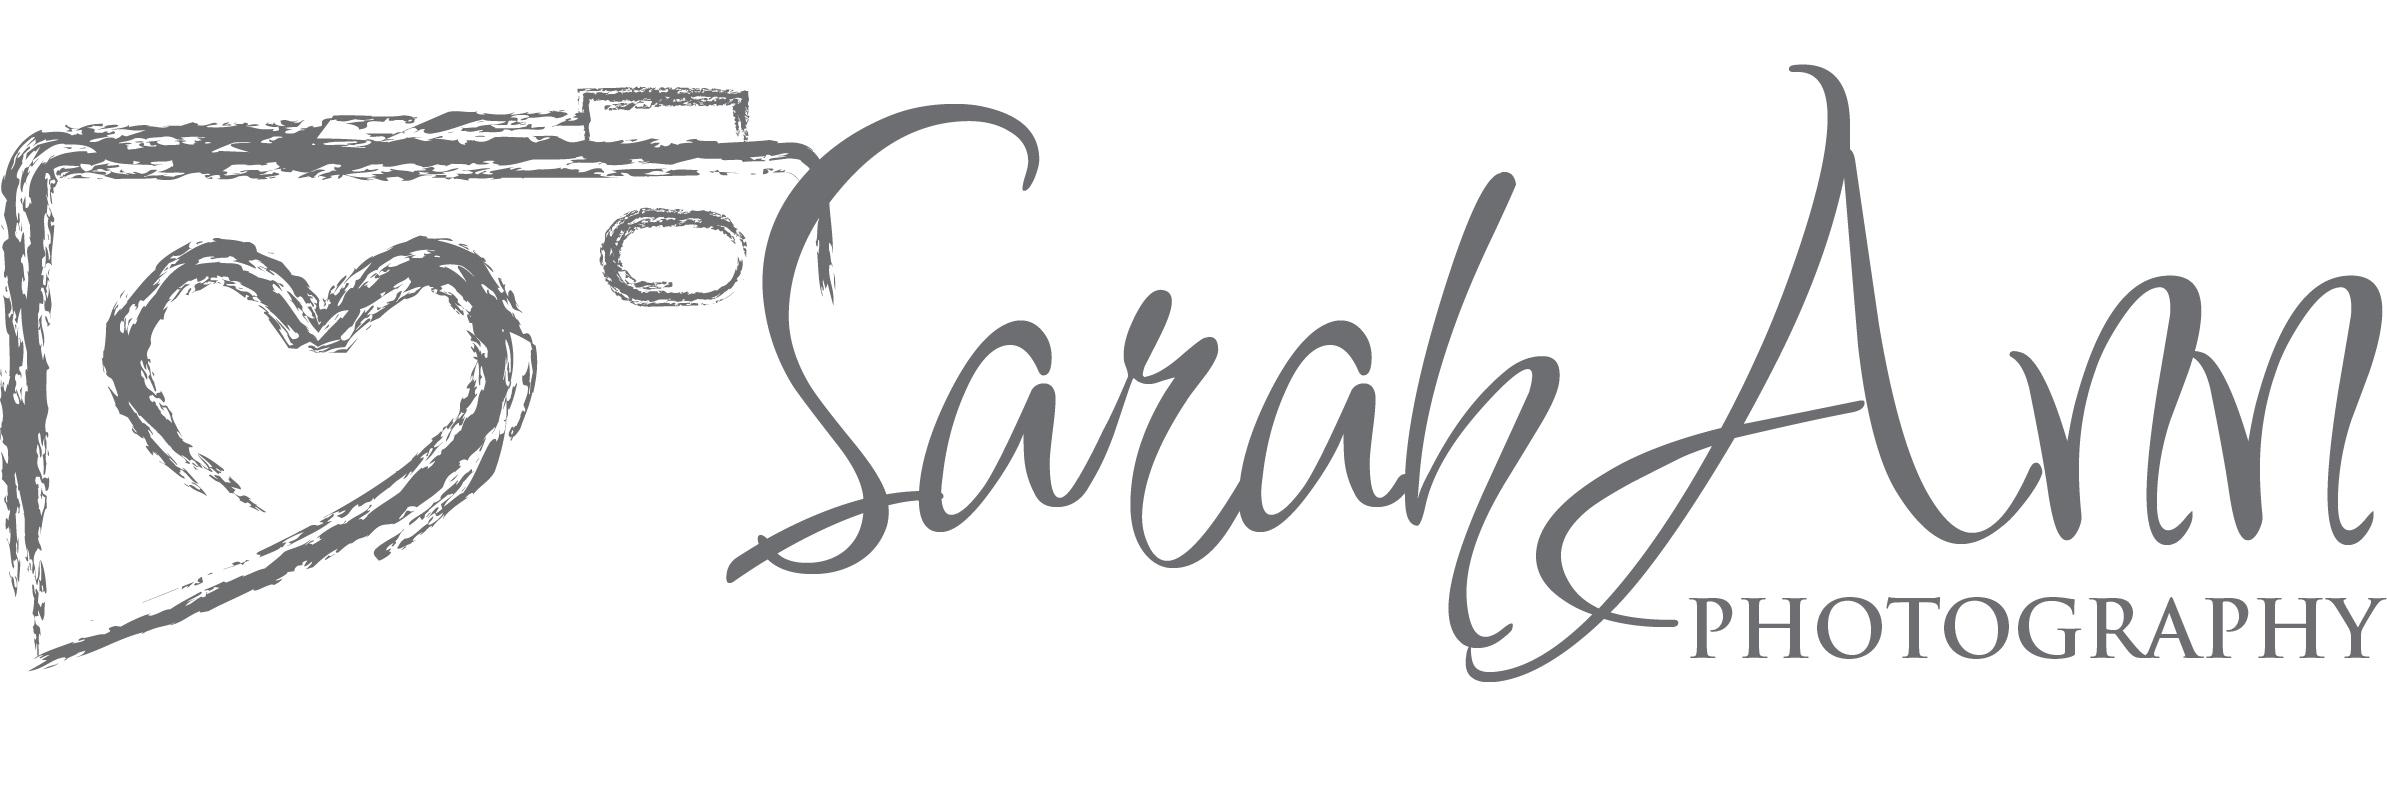 Sarah Ann Photography LLC